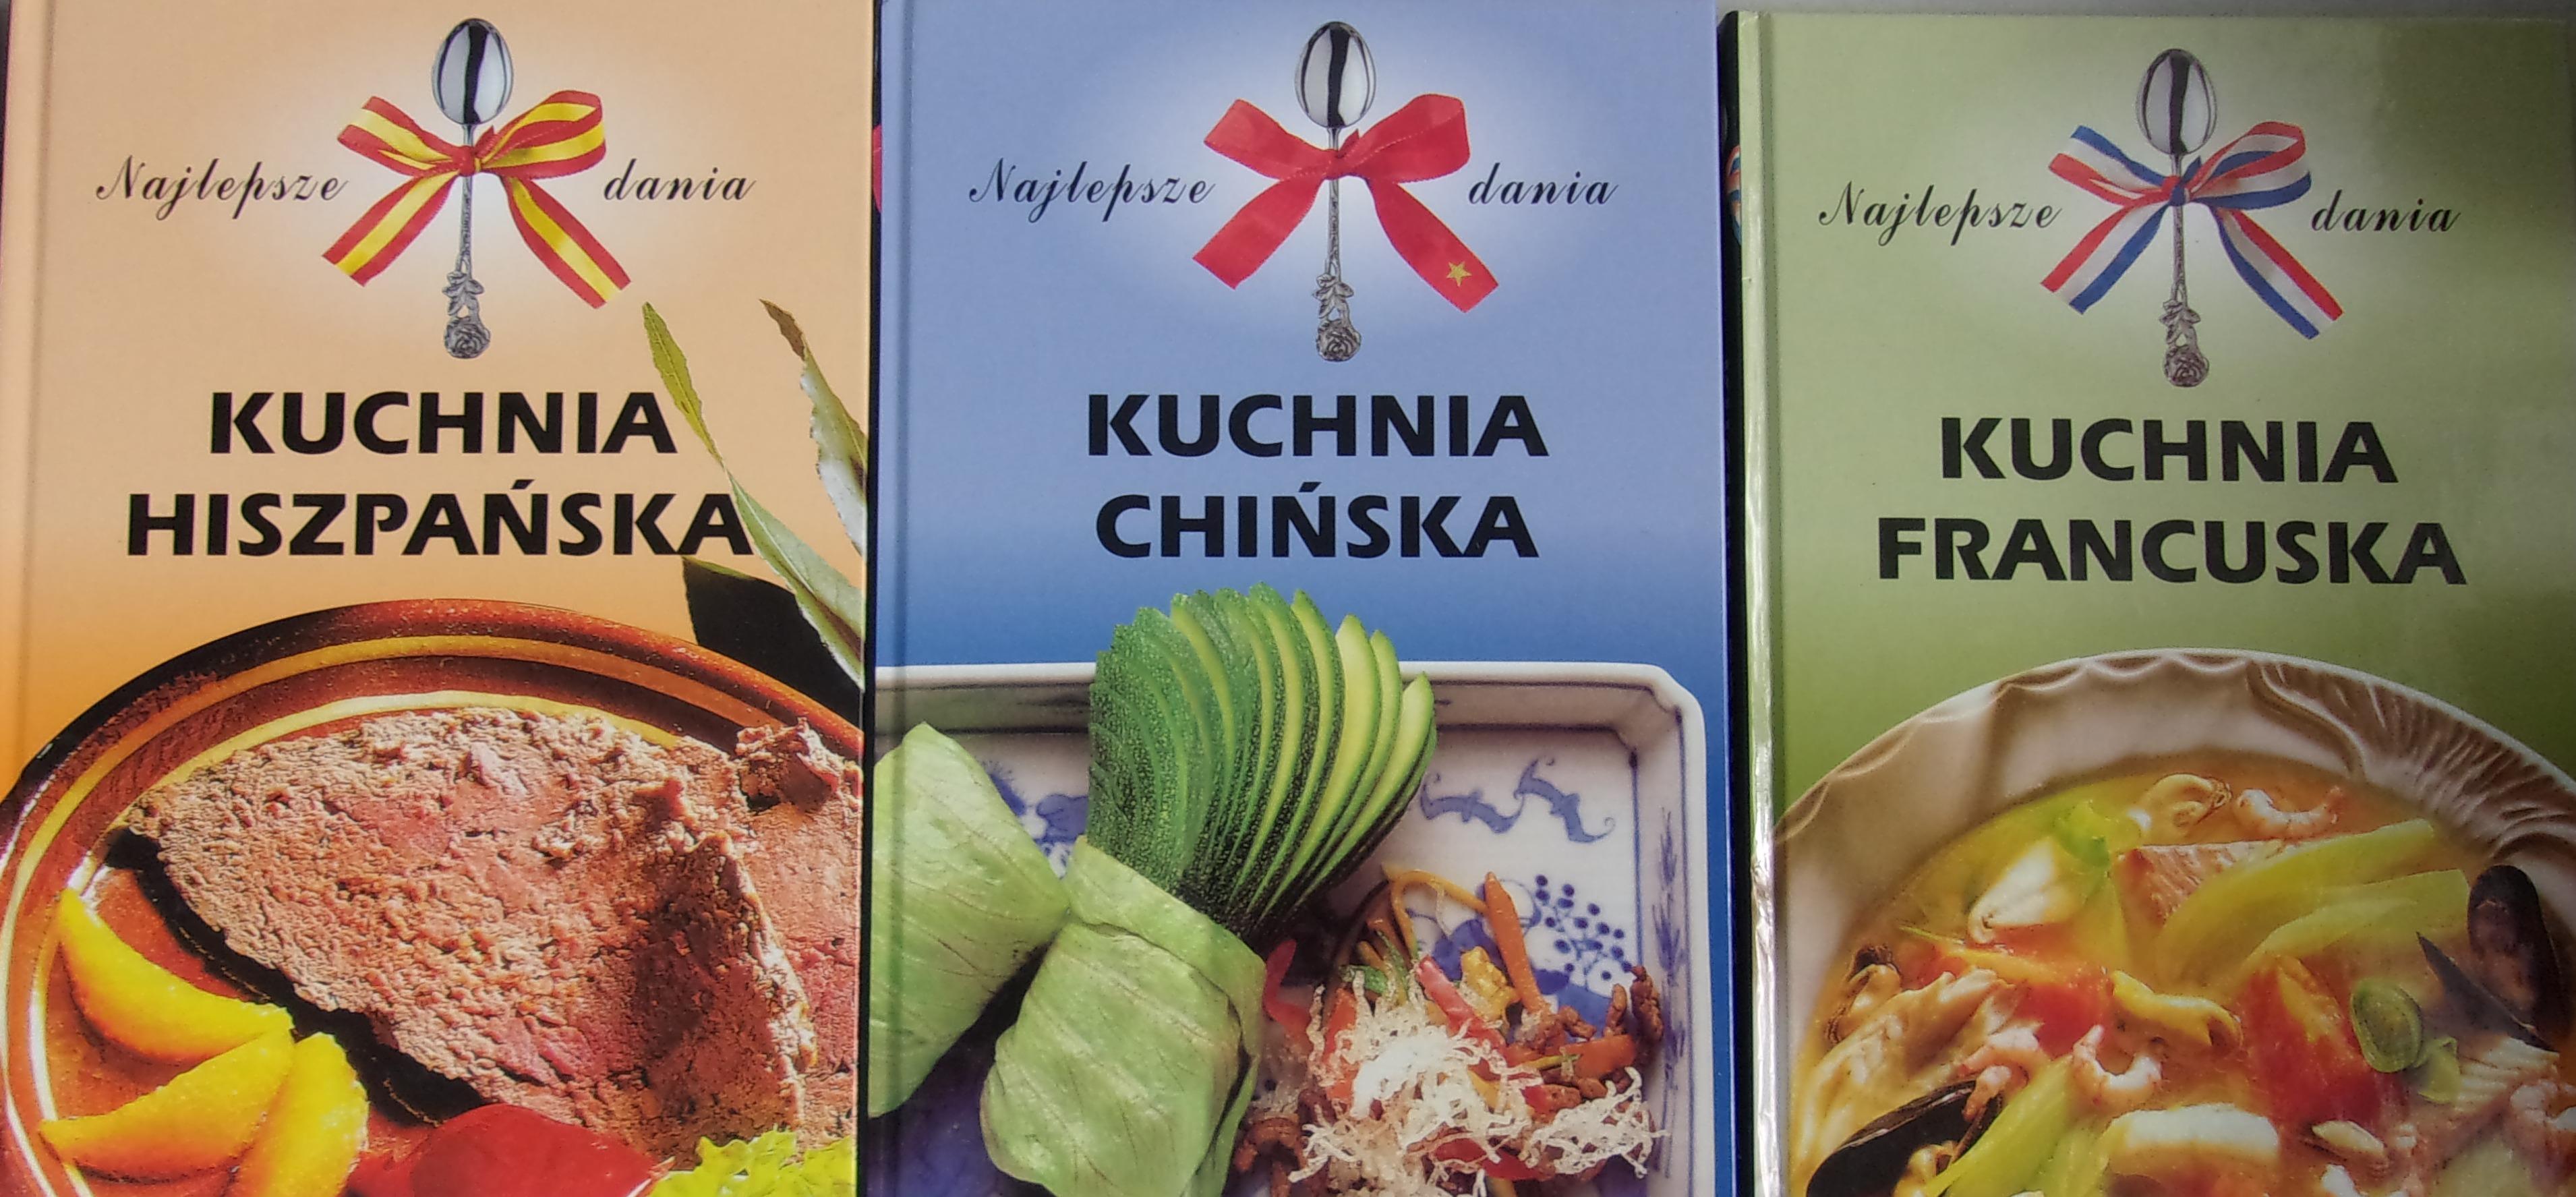 Kuchnia Francuska Kuchnia Chinska Kuchnia Hiszpanska 15 00 Zl